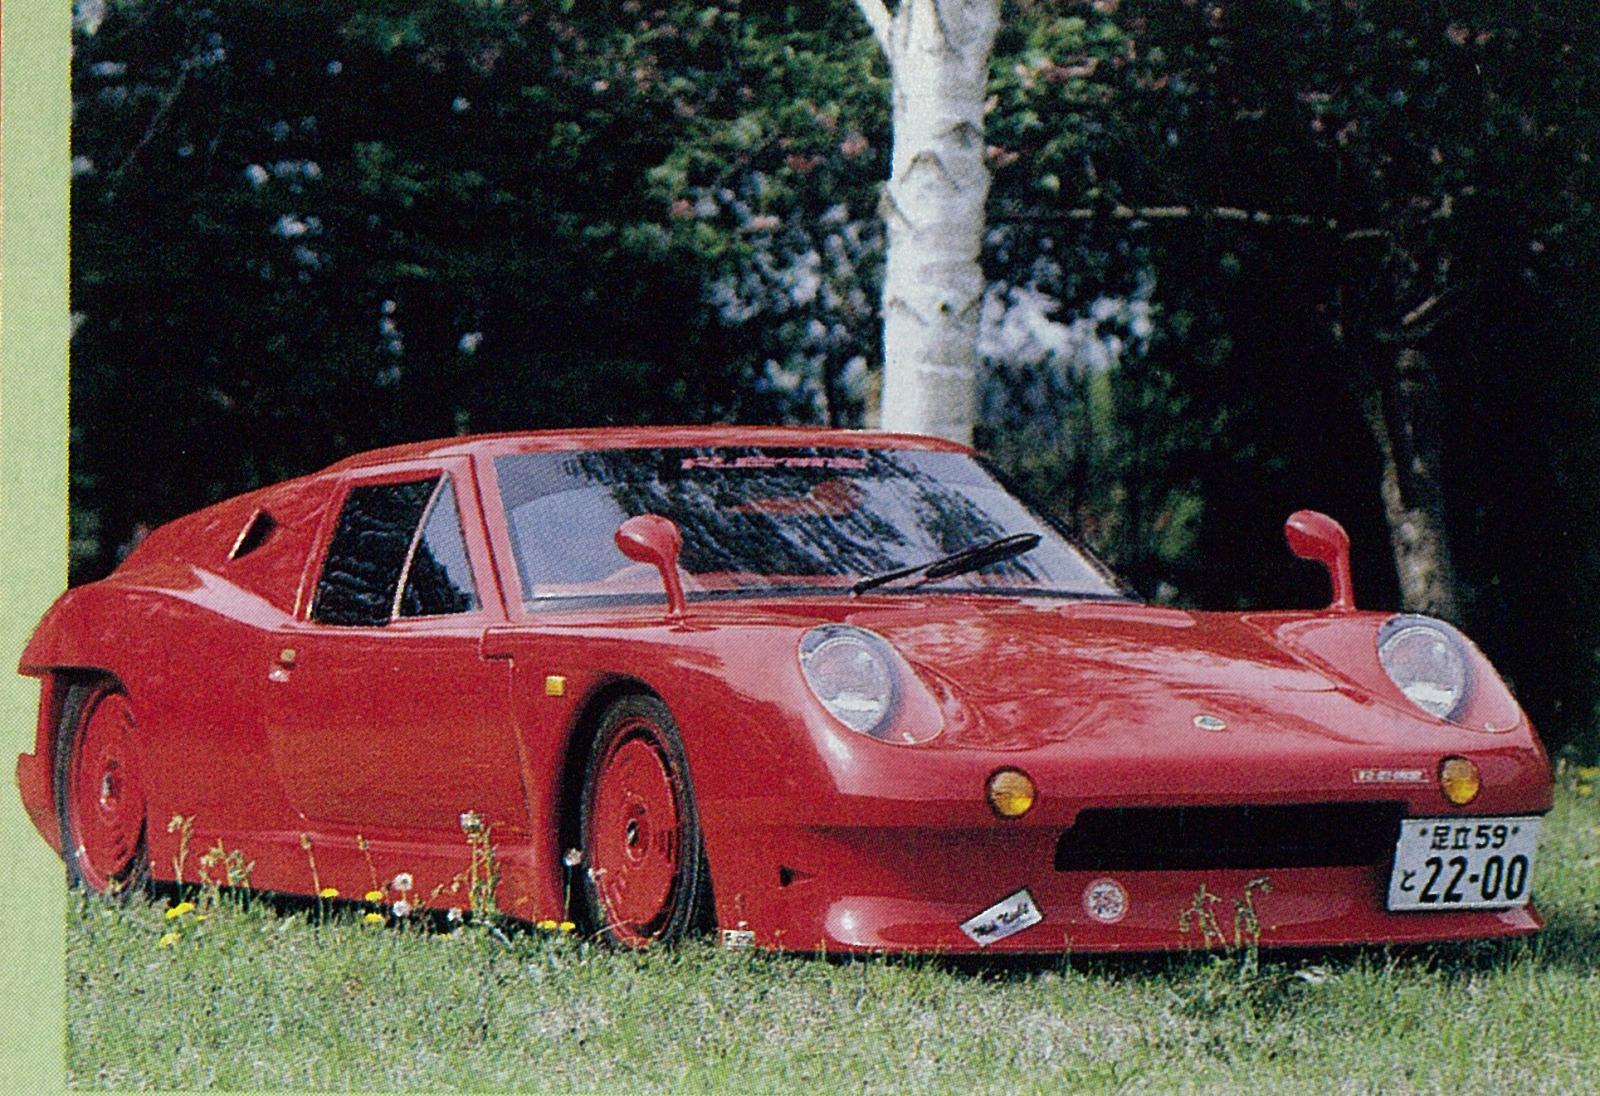 「RE雨宮ロータスヨーロッパ改13Bペリは、今見ても異次元のスーパーマシン【OPTION 1987年7月号より】」の4枚目の画像